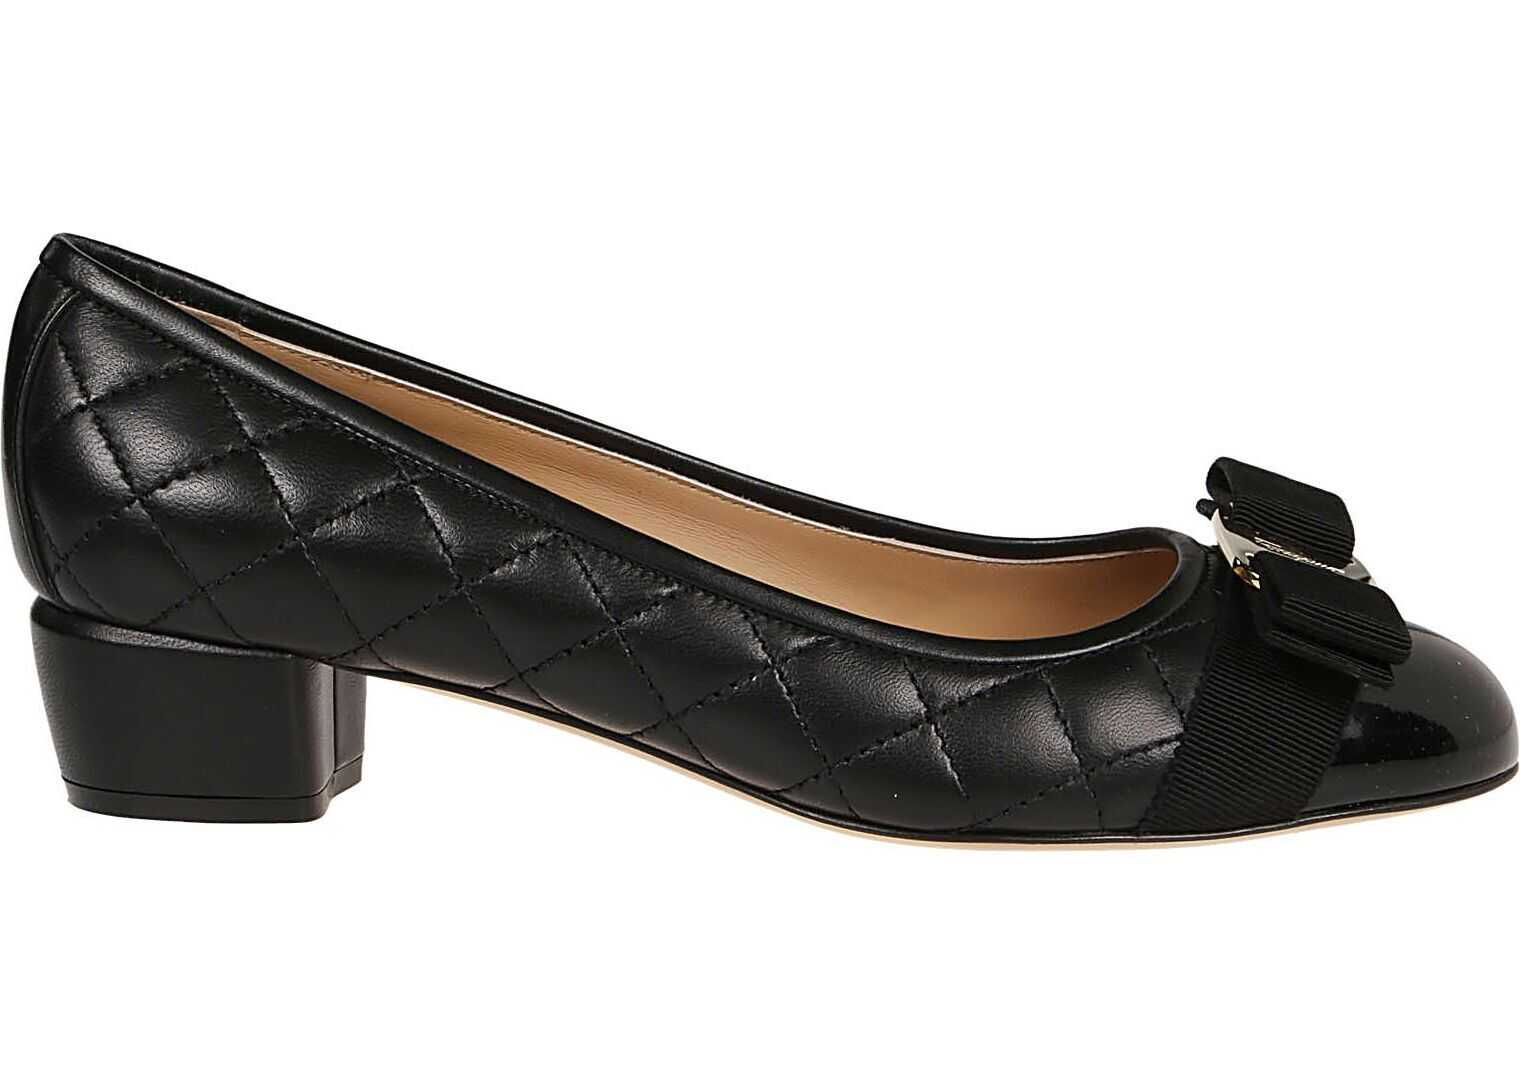 Salvatore Ferragamo Leather Pumps BLACK